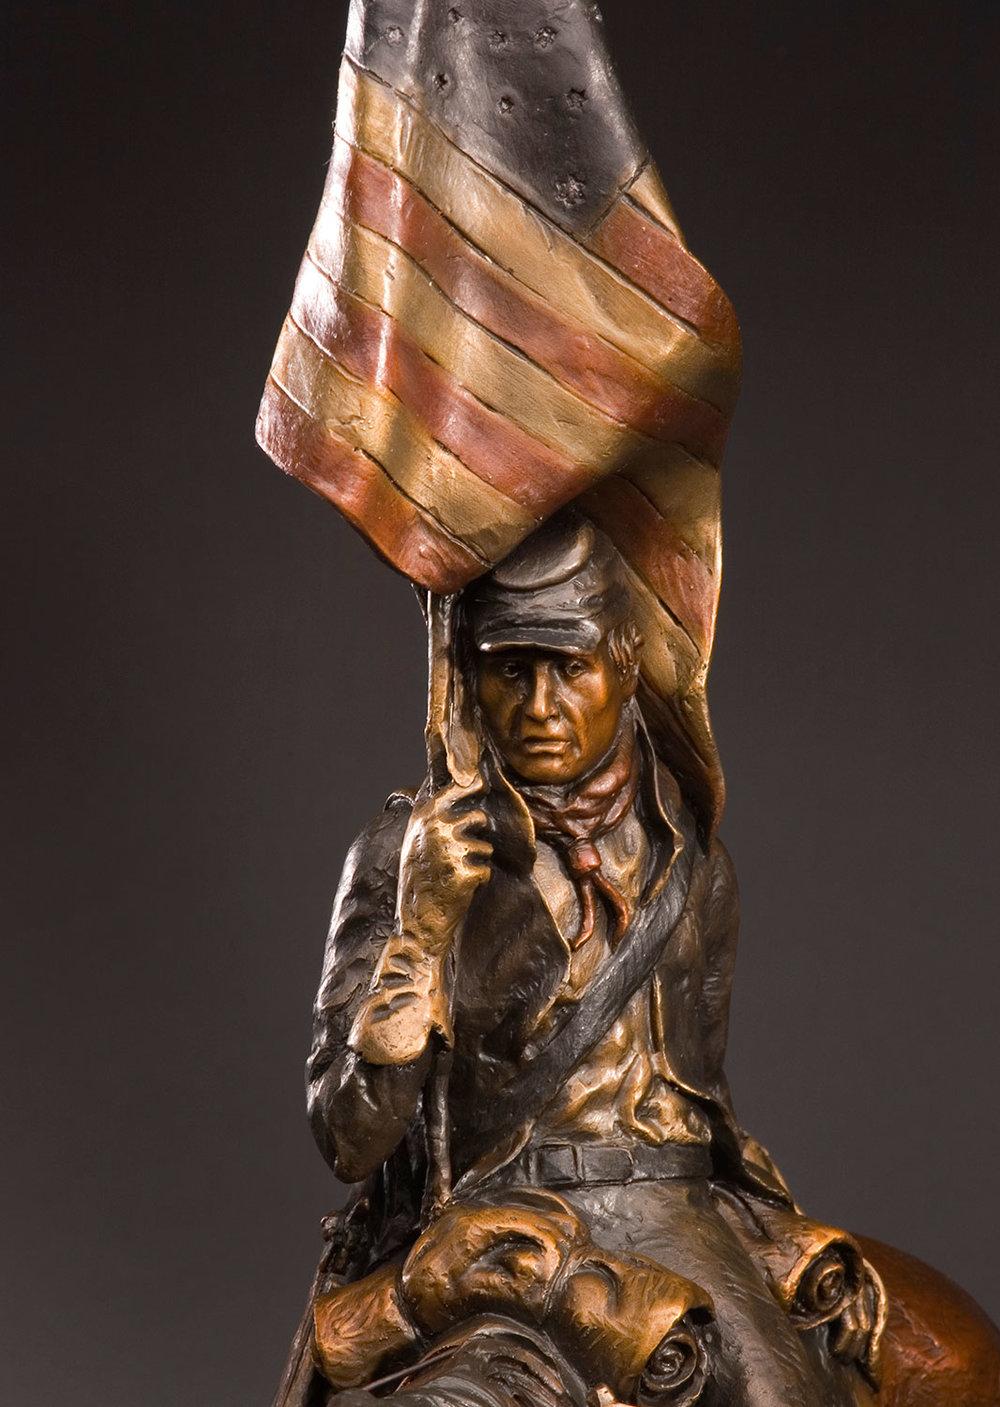 Distant Drums, Historical Art, Patriotic, Soldier